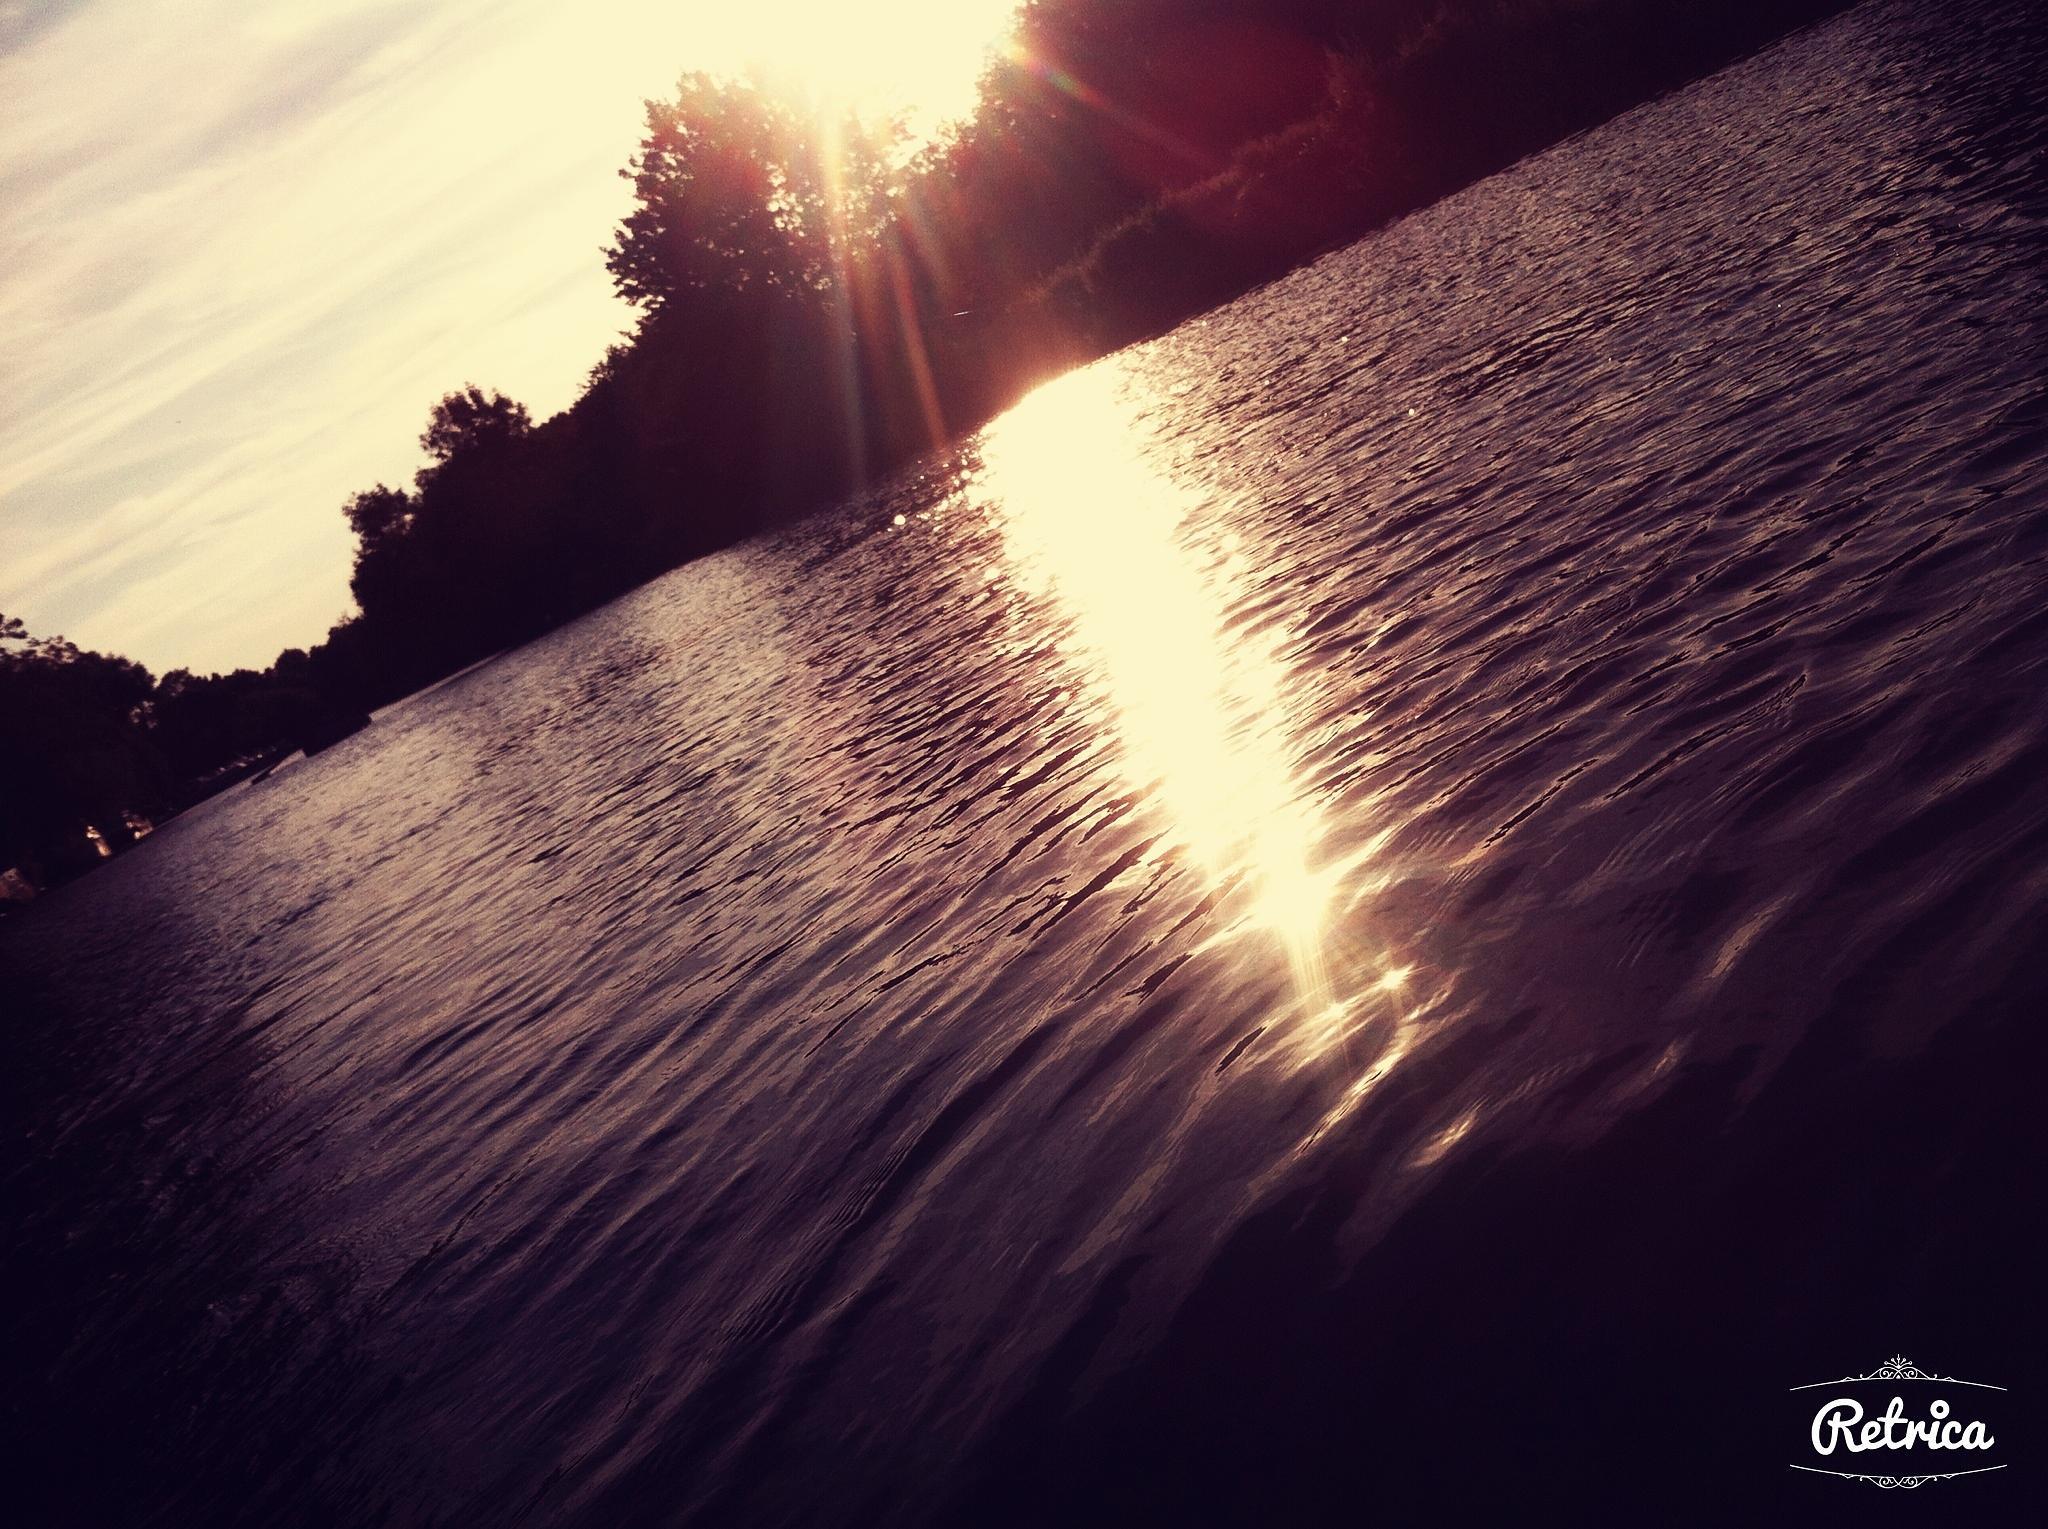 Sun Reflection on the River by kennaclarke